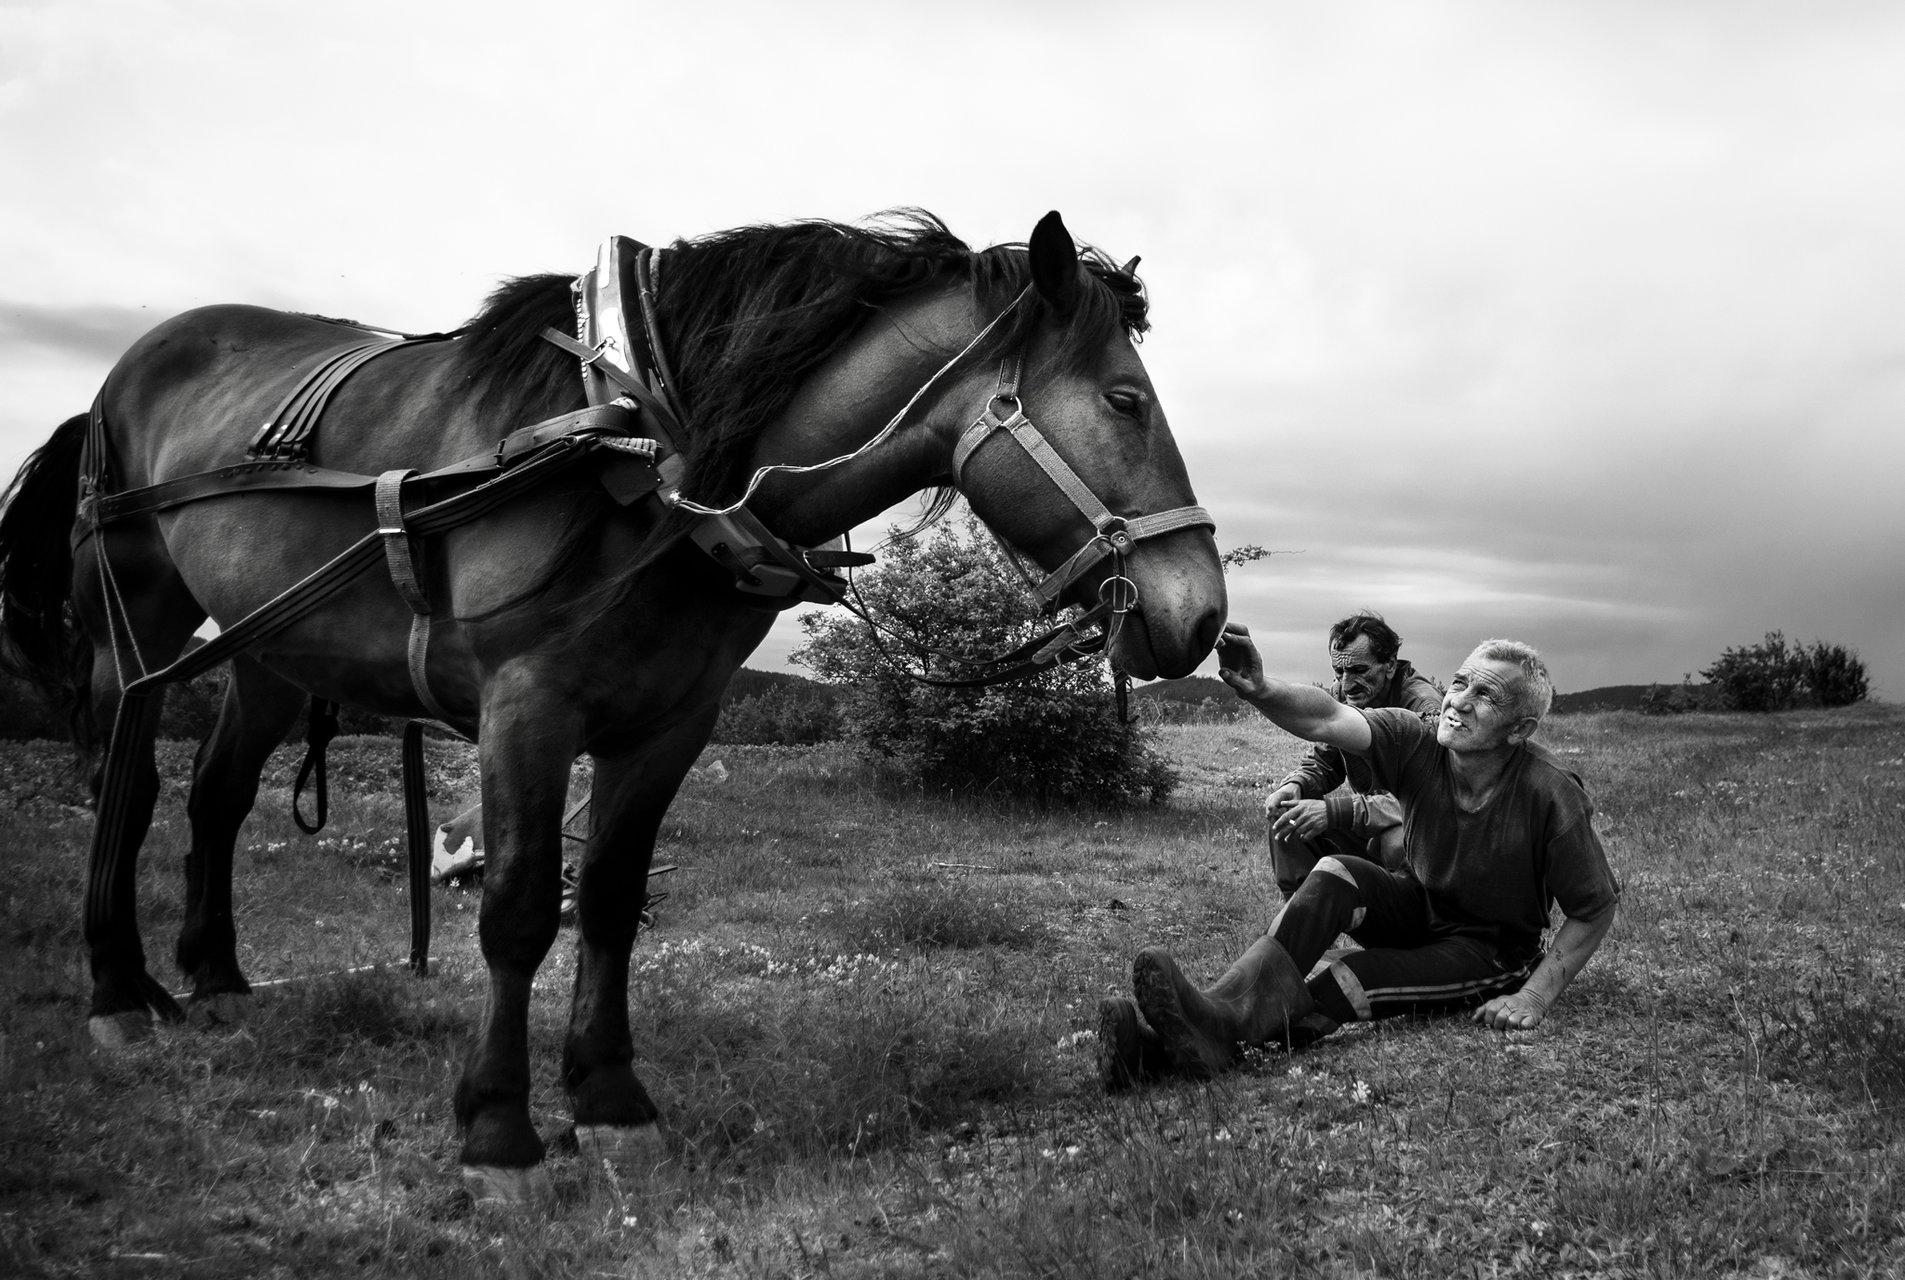 Photo in Daily round | Author Ilina Taneva - Инка | PHOTO FORUM